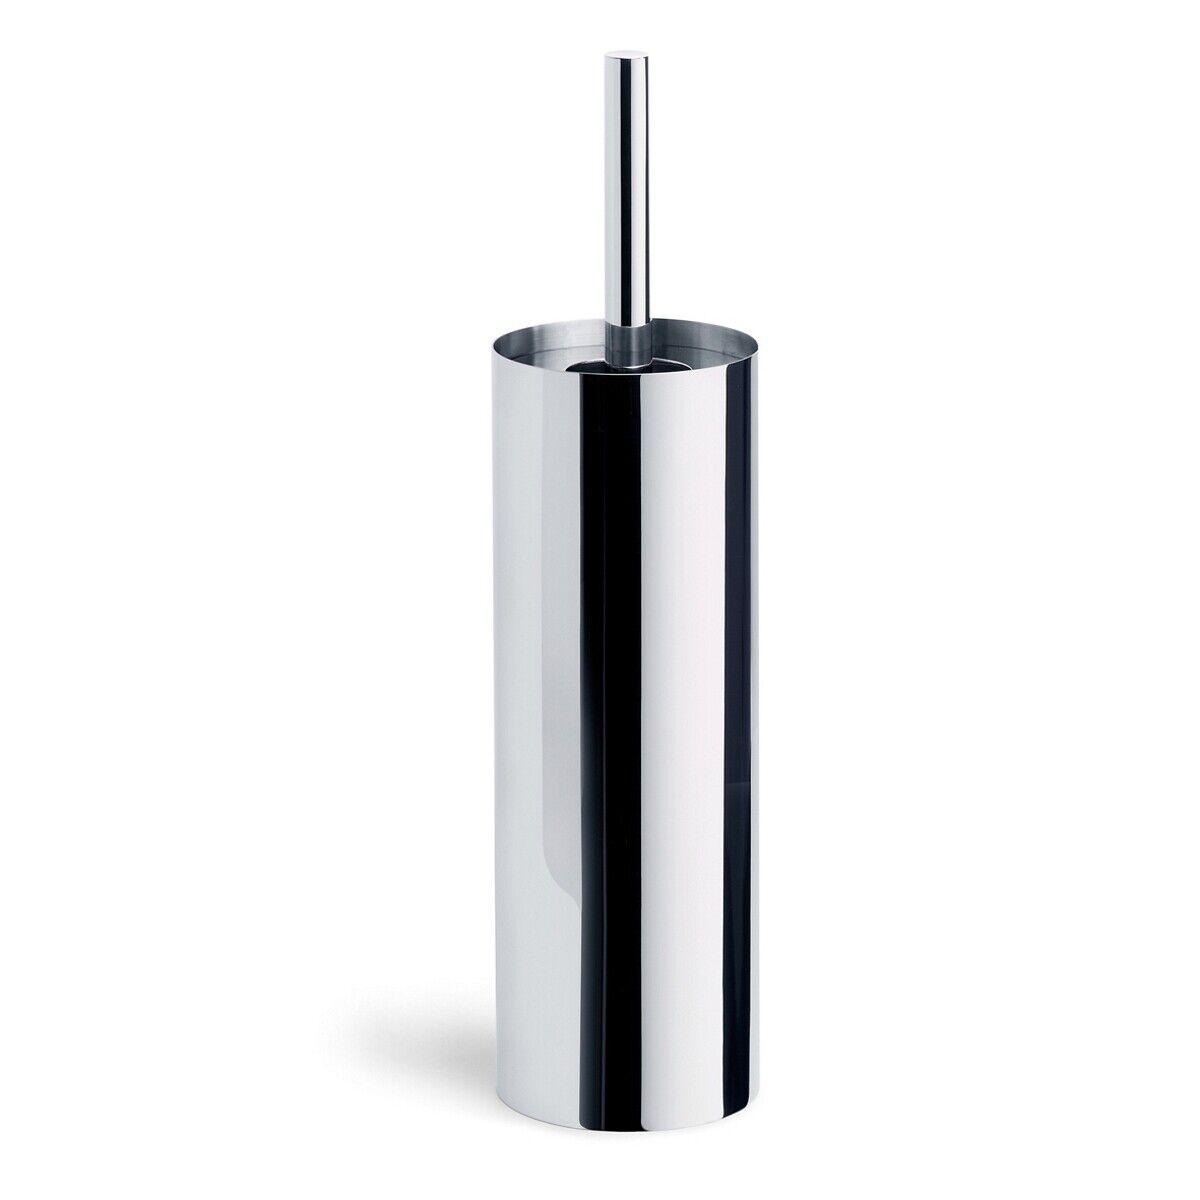 Blomus Acero Inoxidable Pulido Cepillo de Baño H43cm X 9cm Diámetro